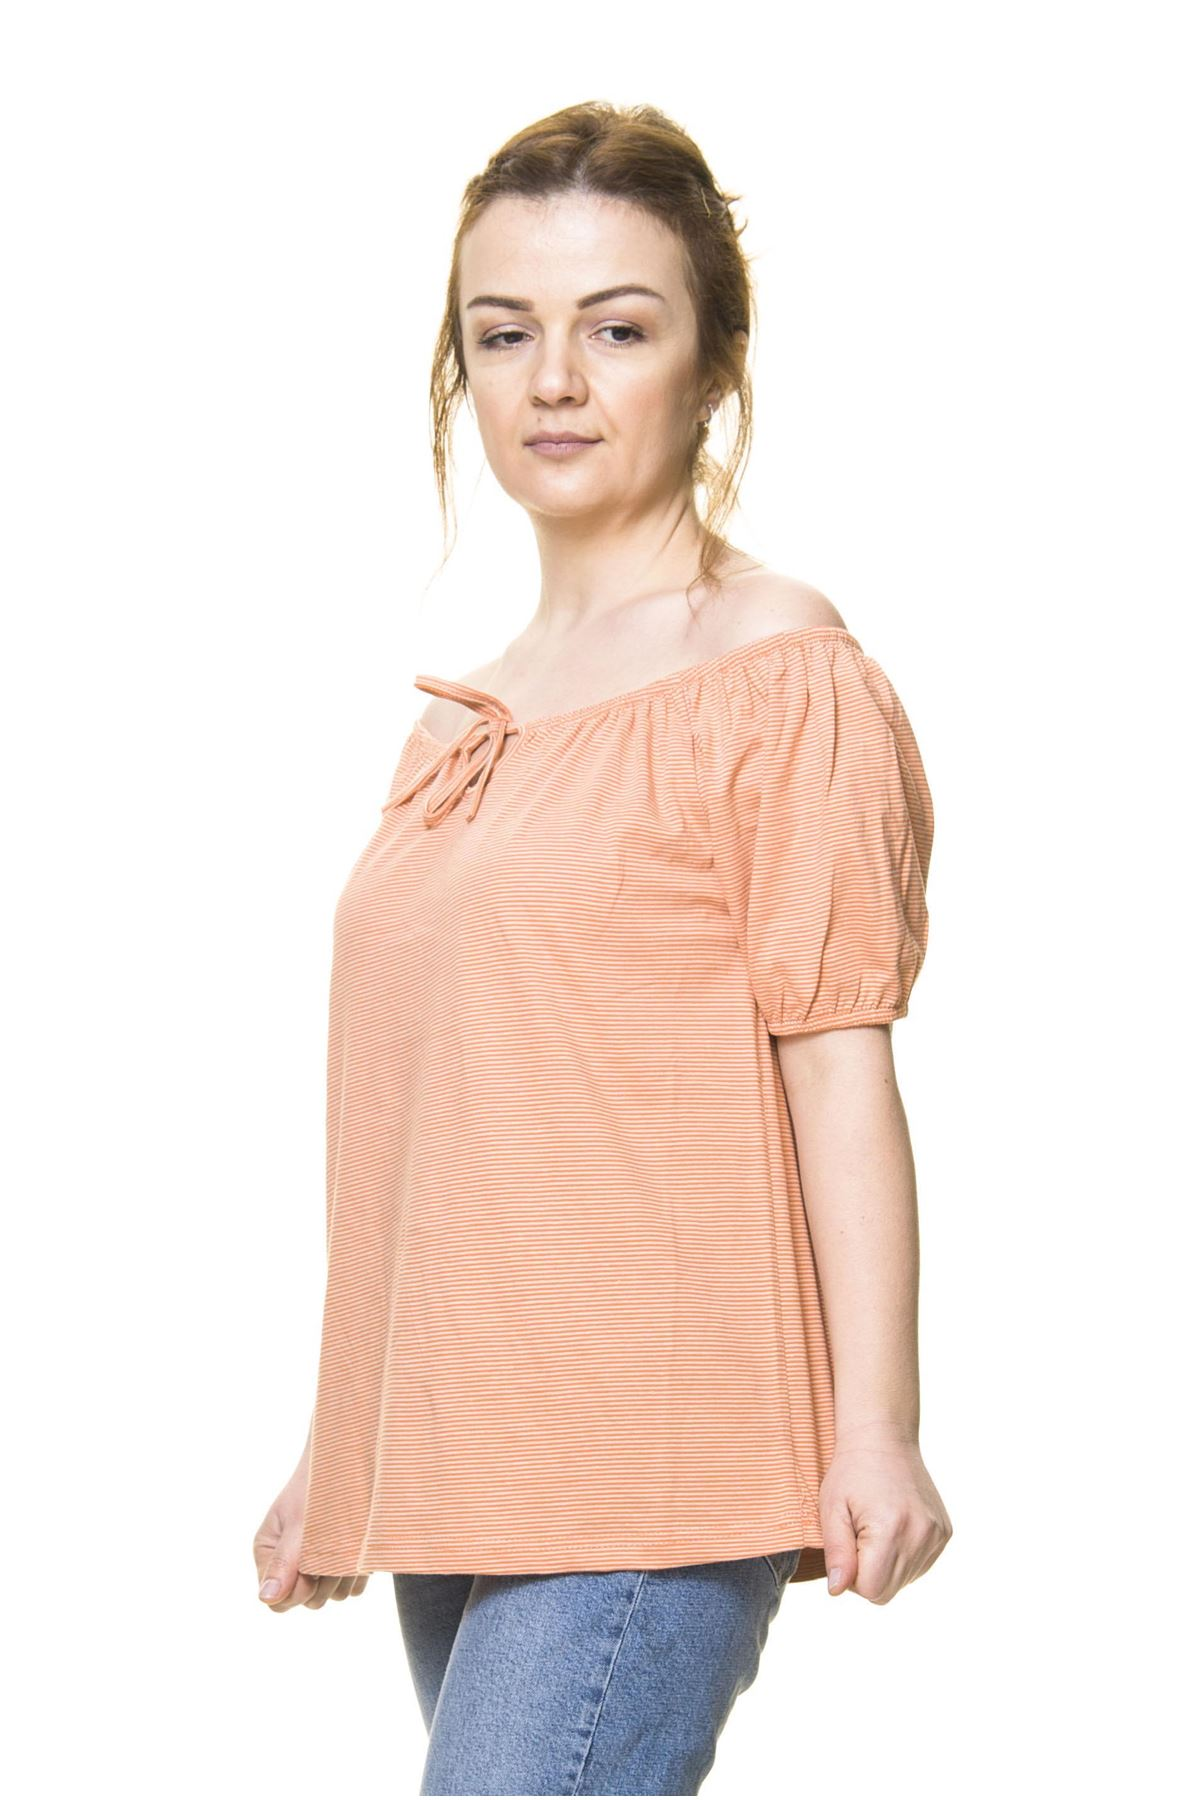 Kadın Turuncu Pamuklu Penye Bluz 5D-3044